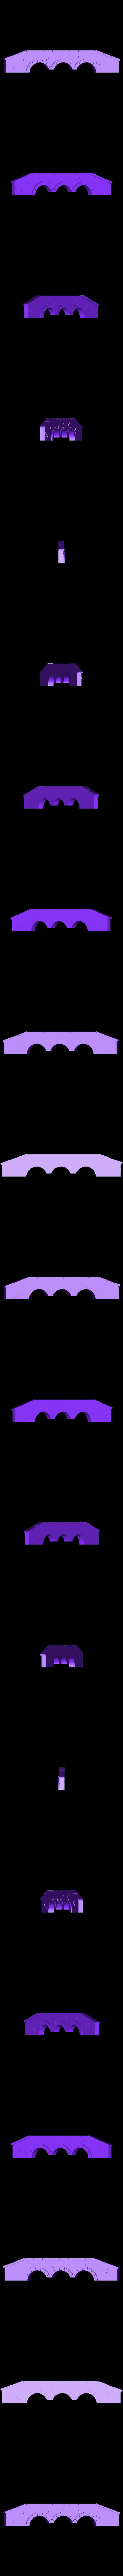 bridgewall2.stl Download free STL file The Stone Bridge • 3D printable model, Earsling